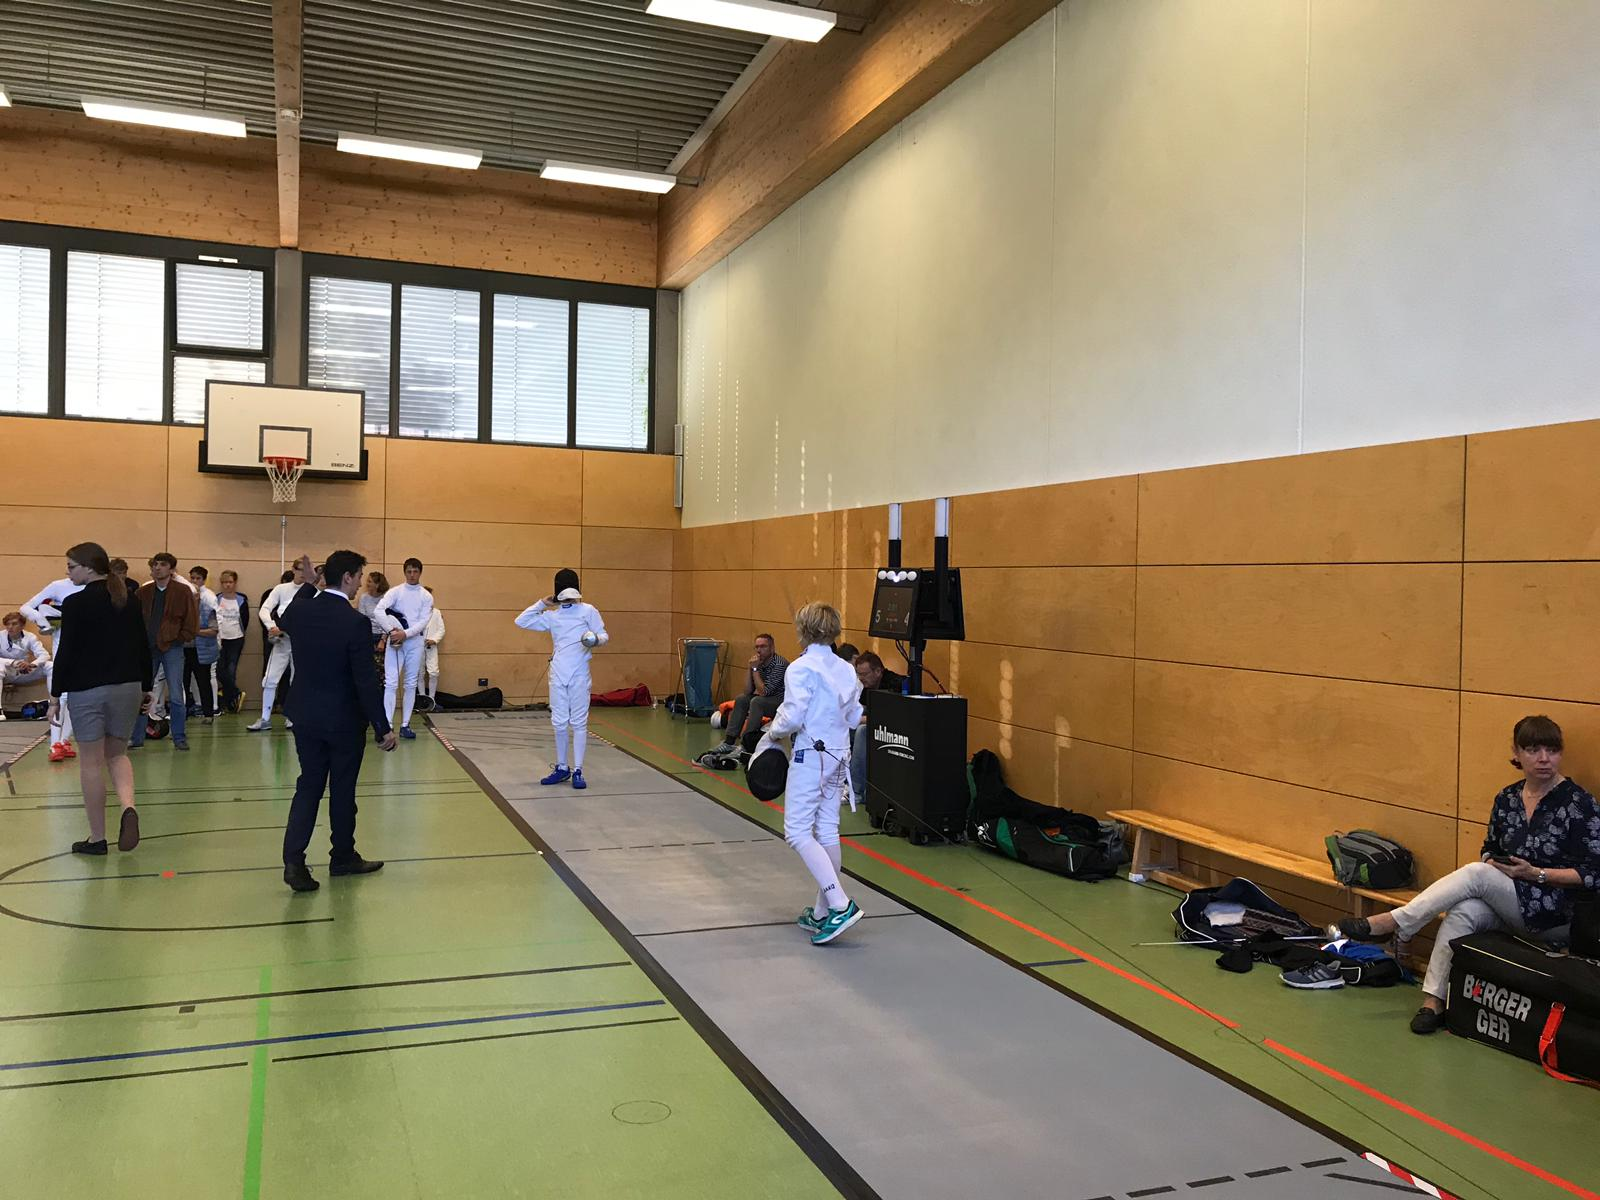 Heidenheim-2018-10-13-1.jpeg